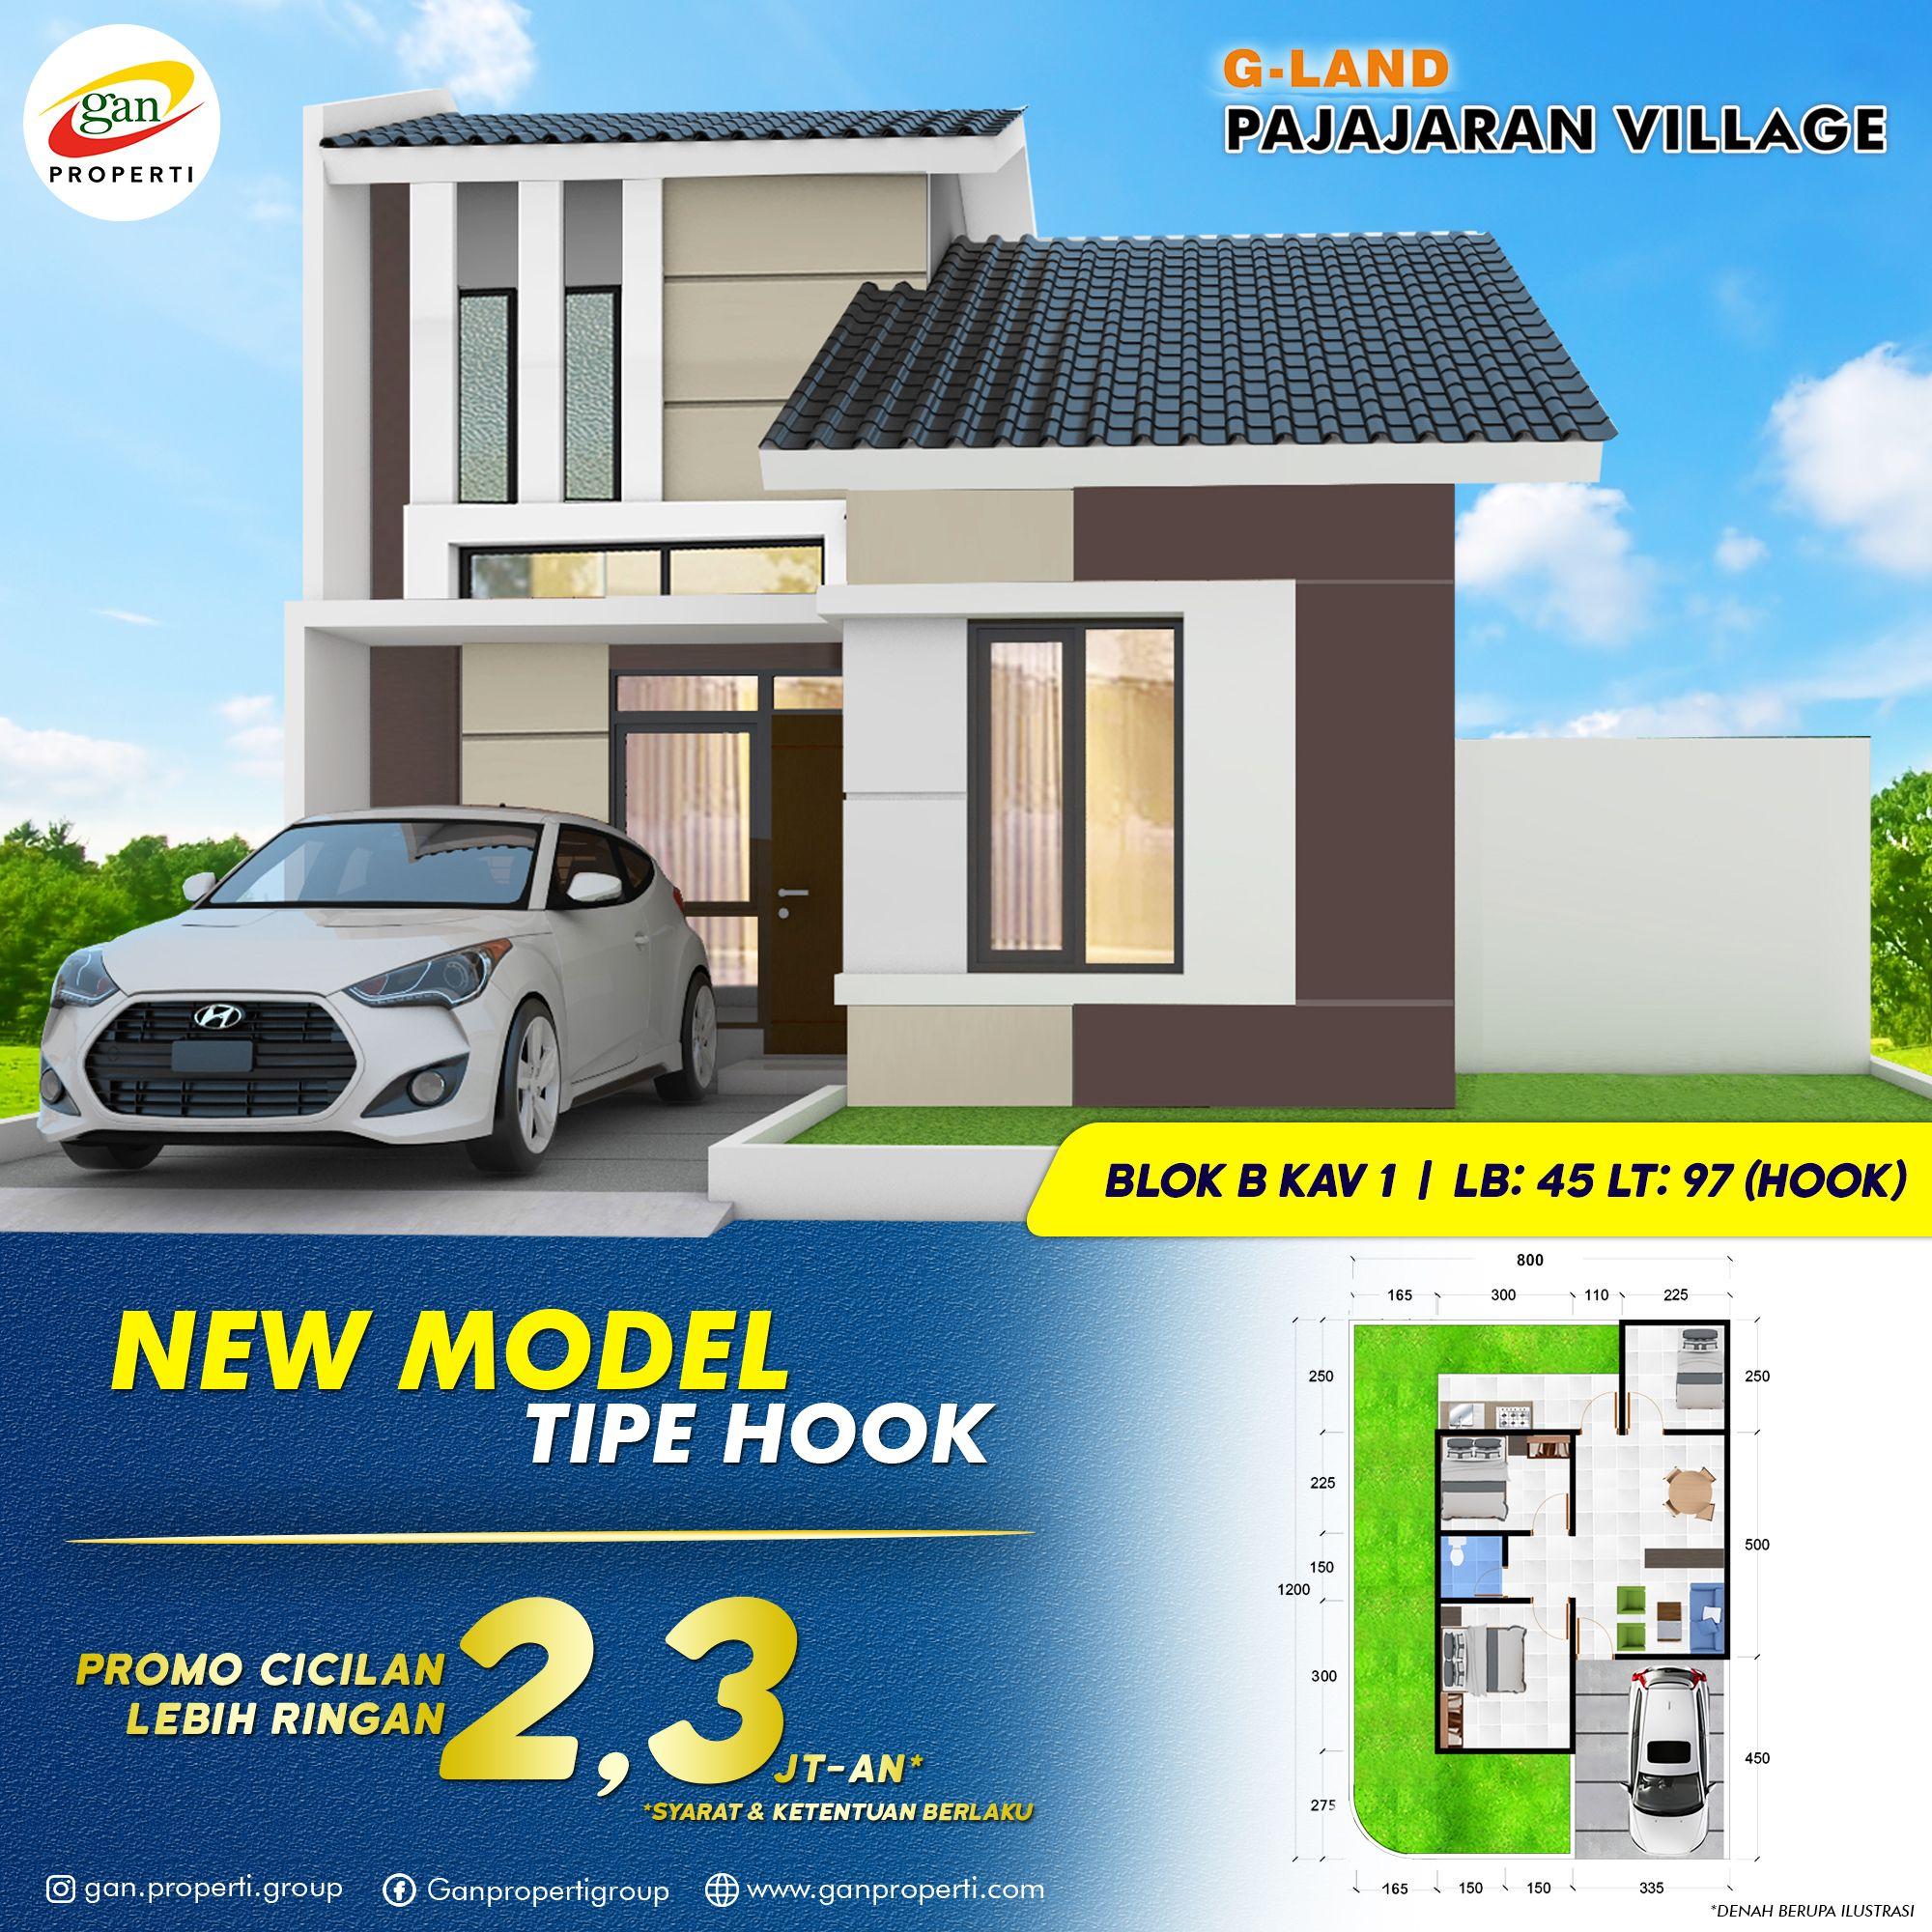 Jual Rumah Baru Di Bandung Selatan Soreang Banjaran Cangkuan Cikalong Harga Murah Terjangkau Rumah Rumah Baru Lantai